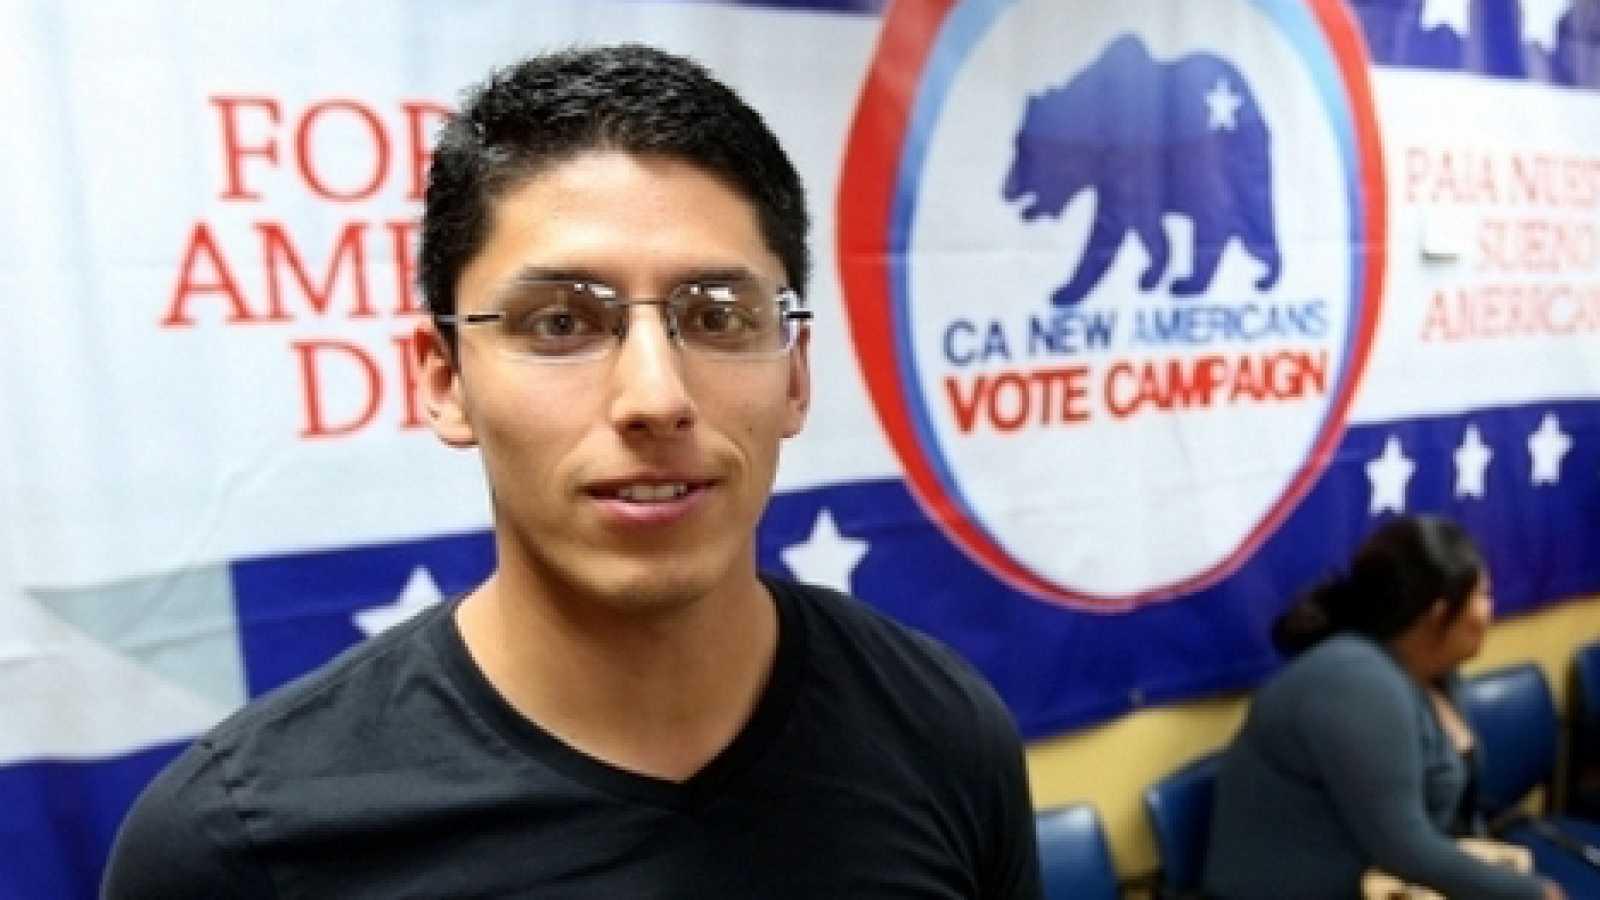 América hoy - Justino Mora, un 'dreamer' latino de EE. UU. - escuchar ahora